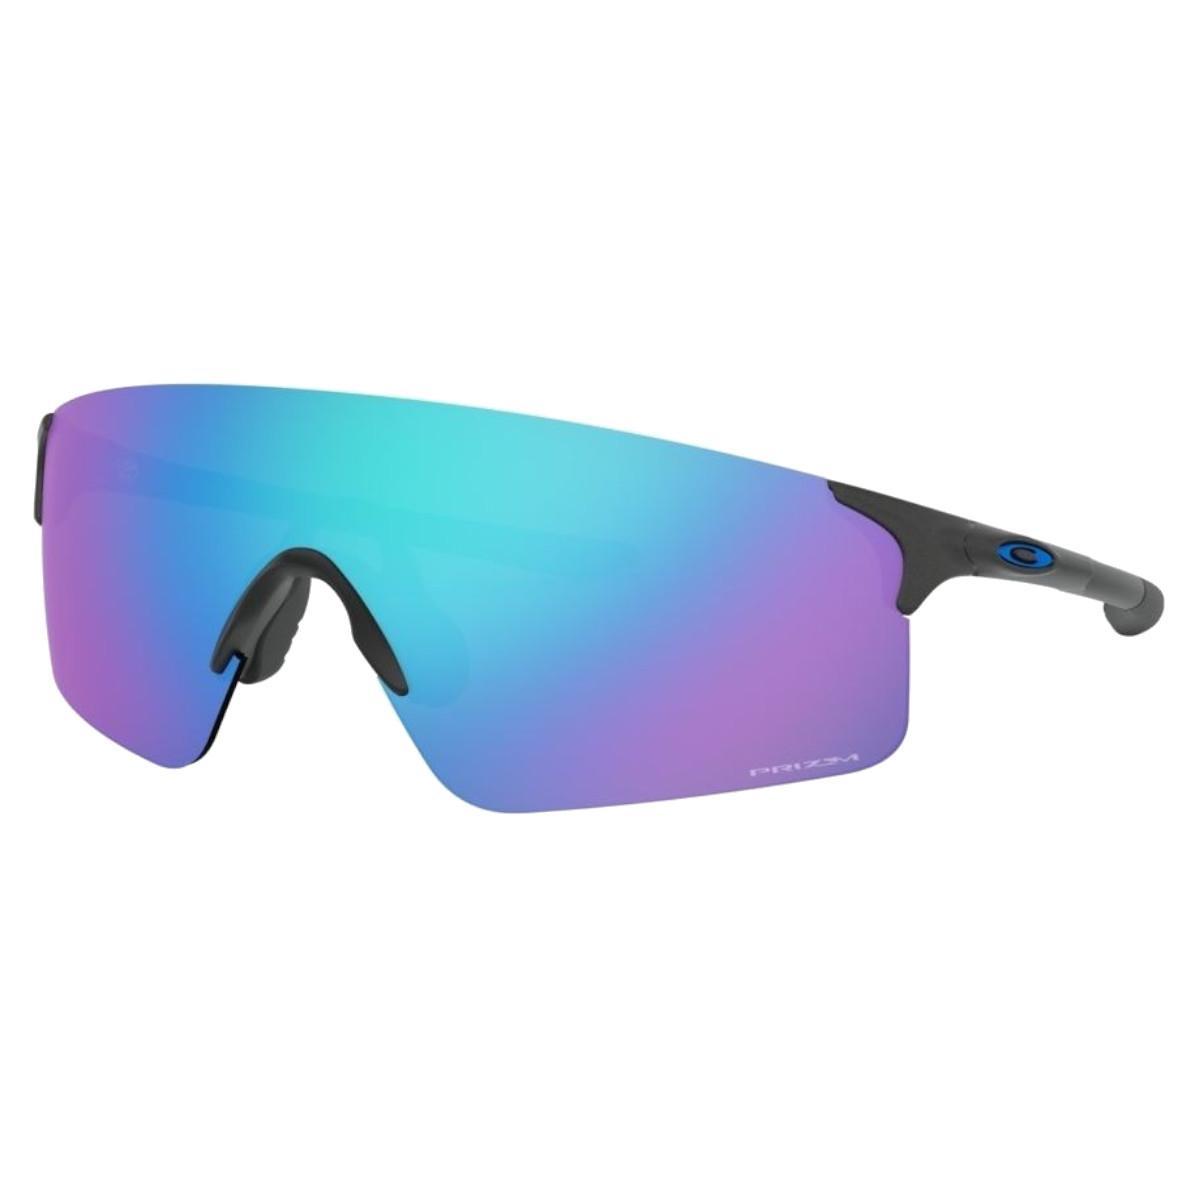 Óculos Oakley Evzero Blades Steel Prizm Sapphire Iridium